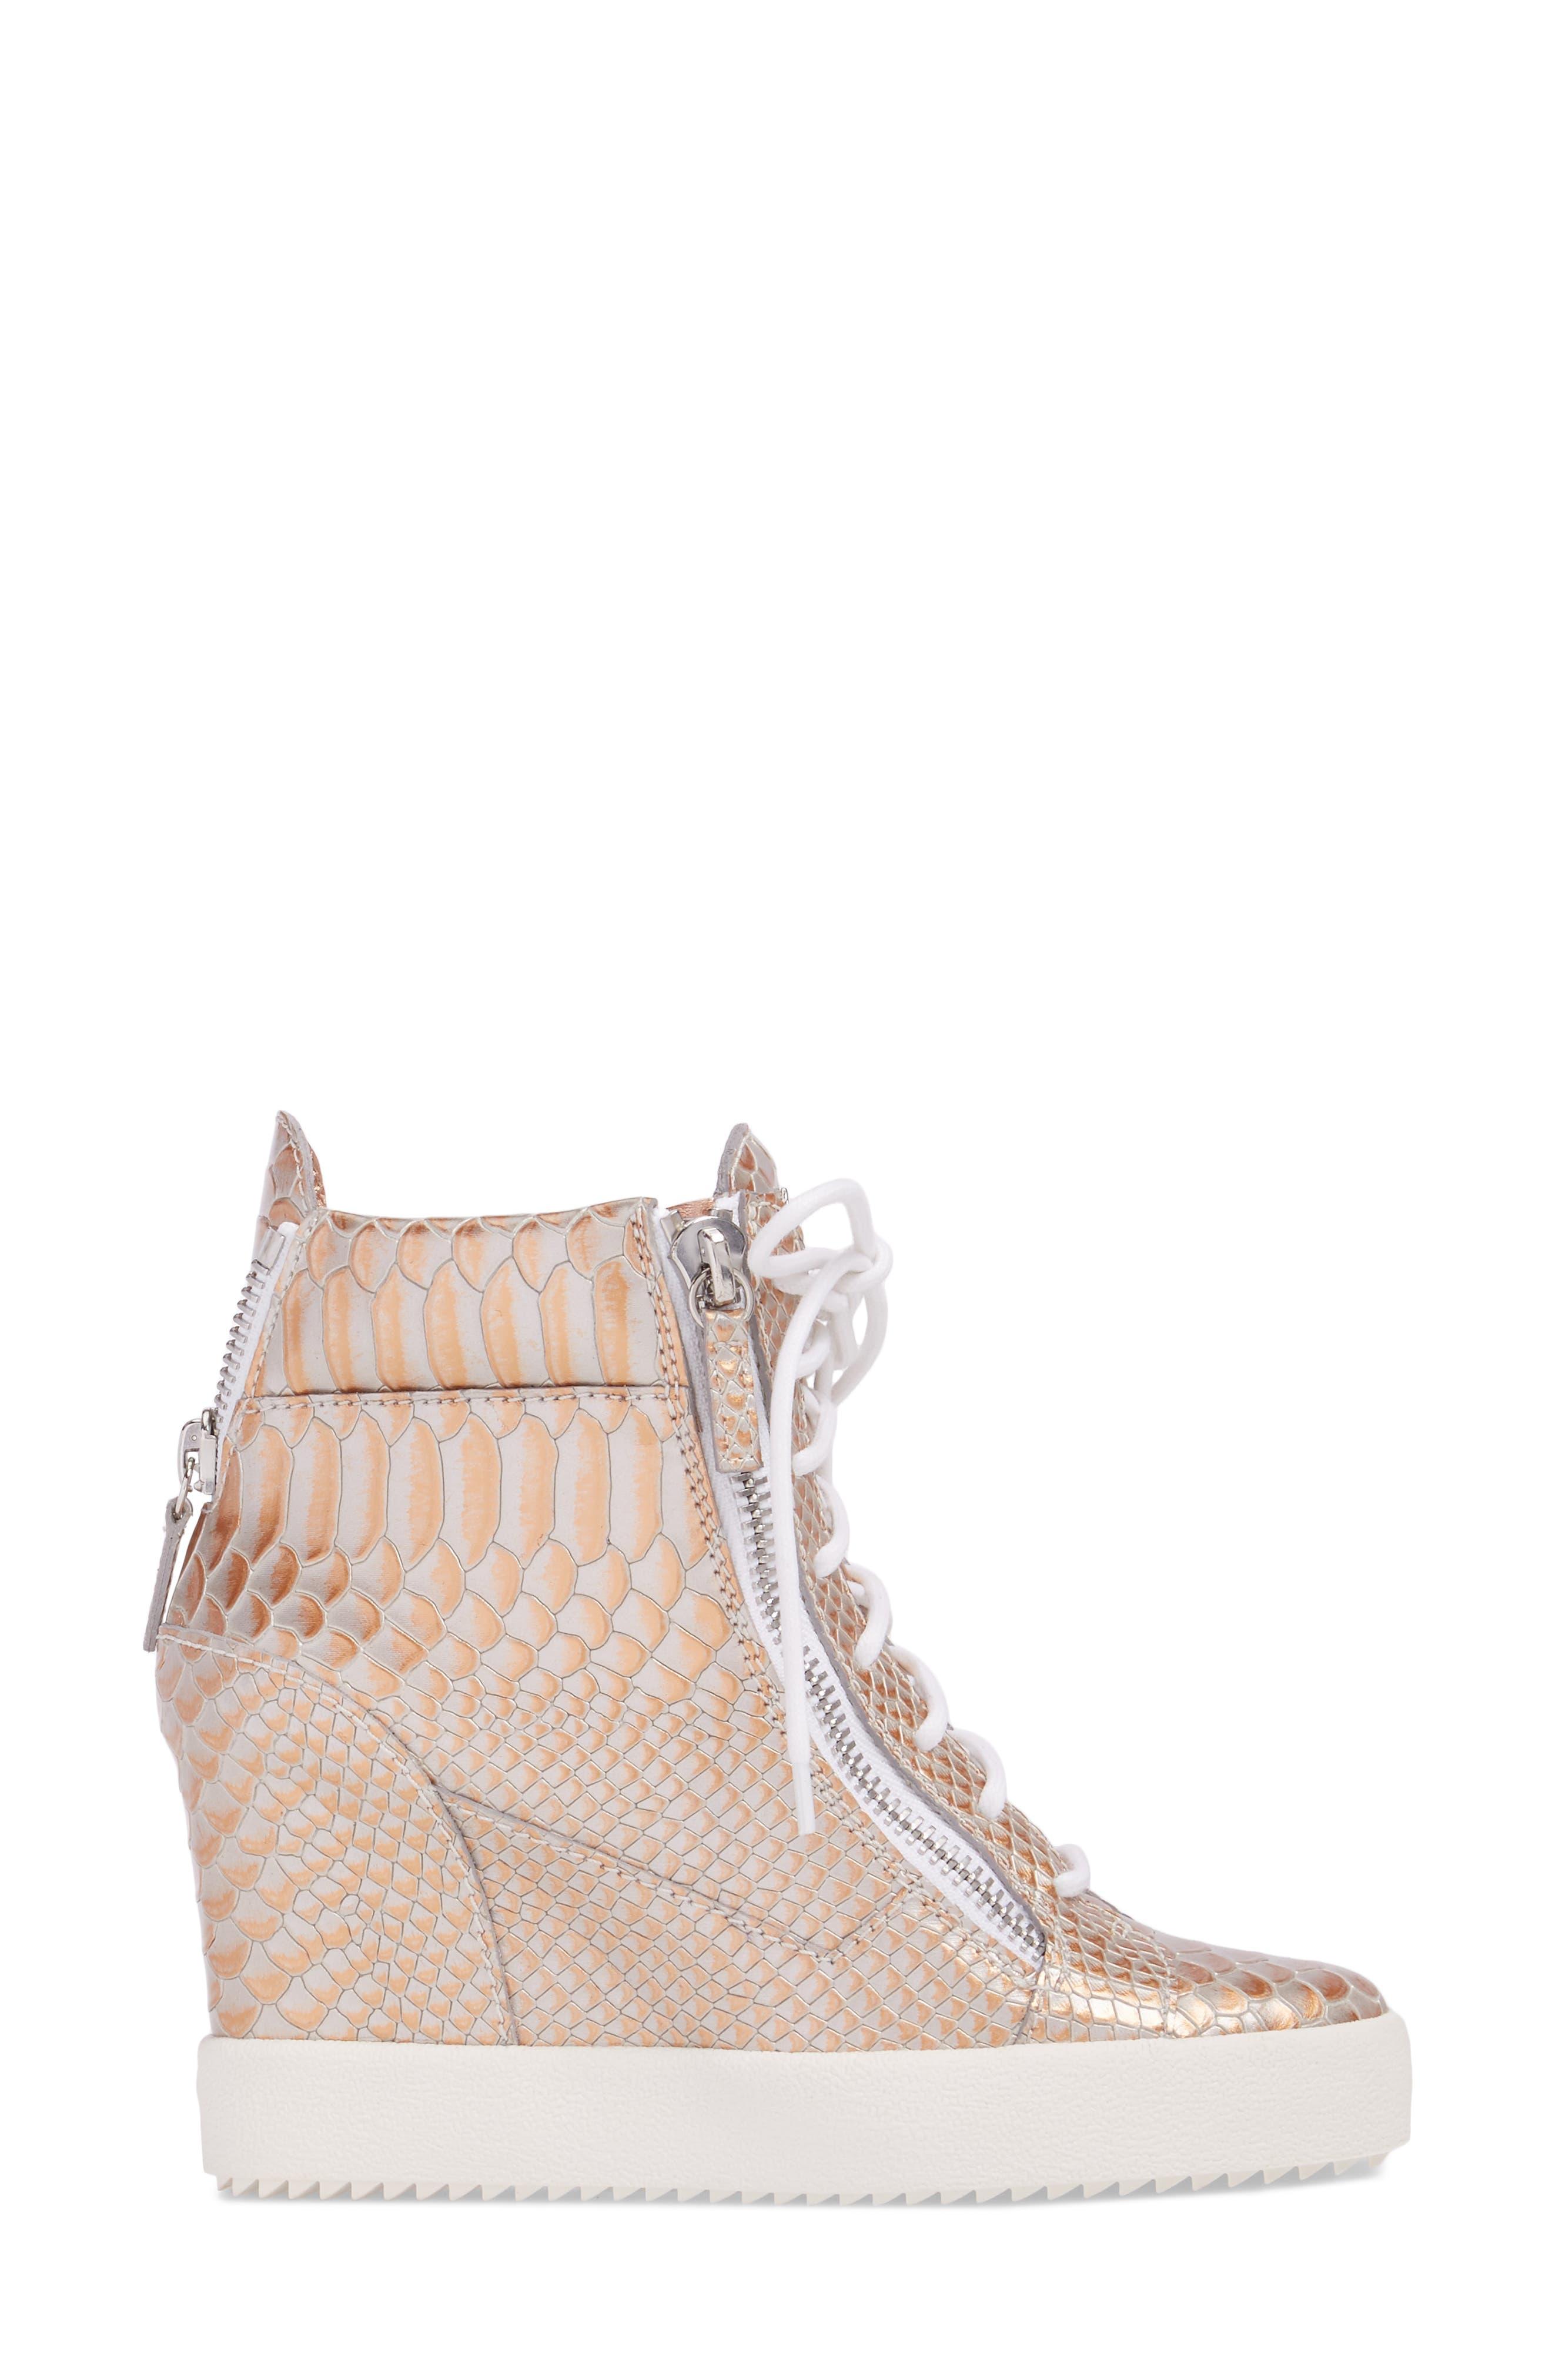 Lamay Lorenz High Top Wedge Sneaker,                             Alternate thumbnail 3, color,                             710